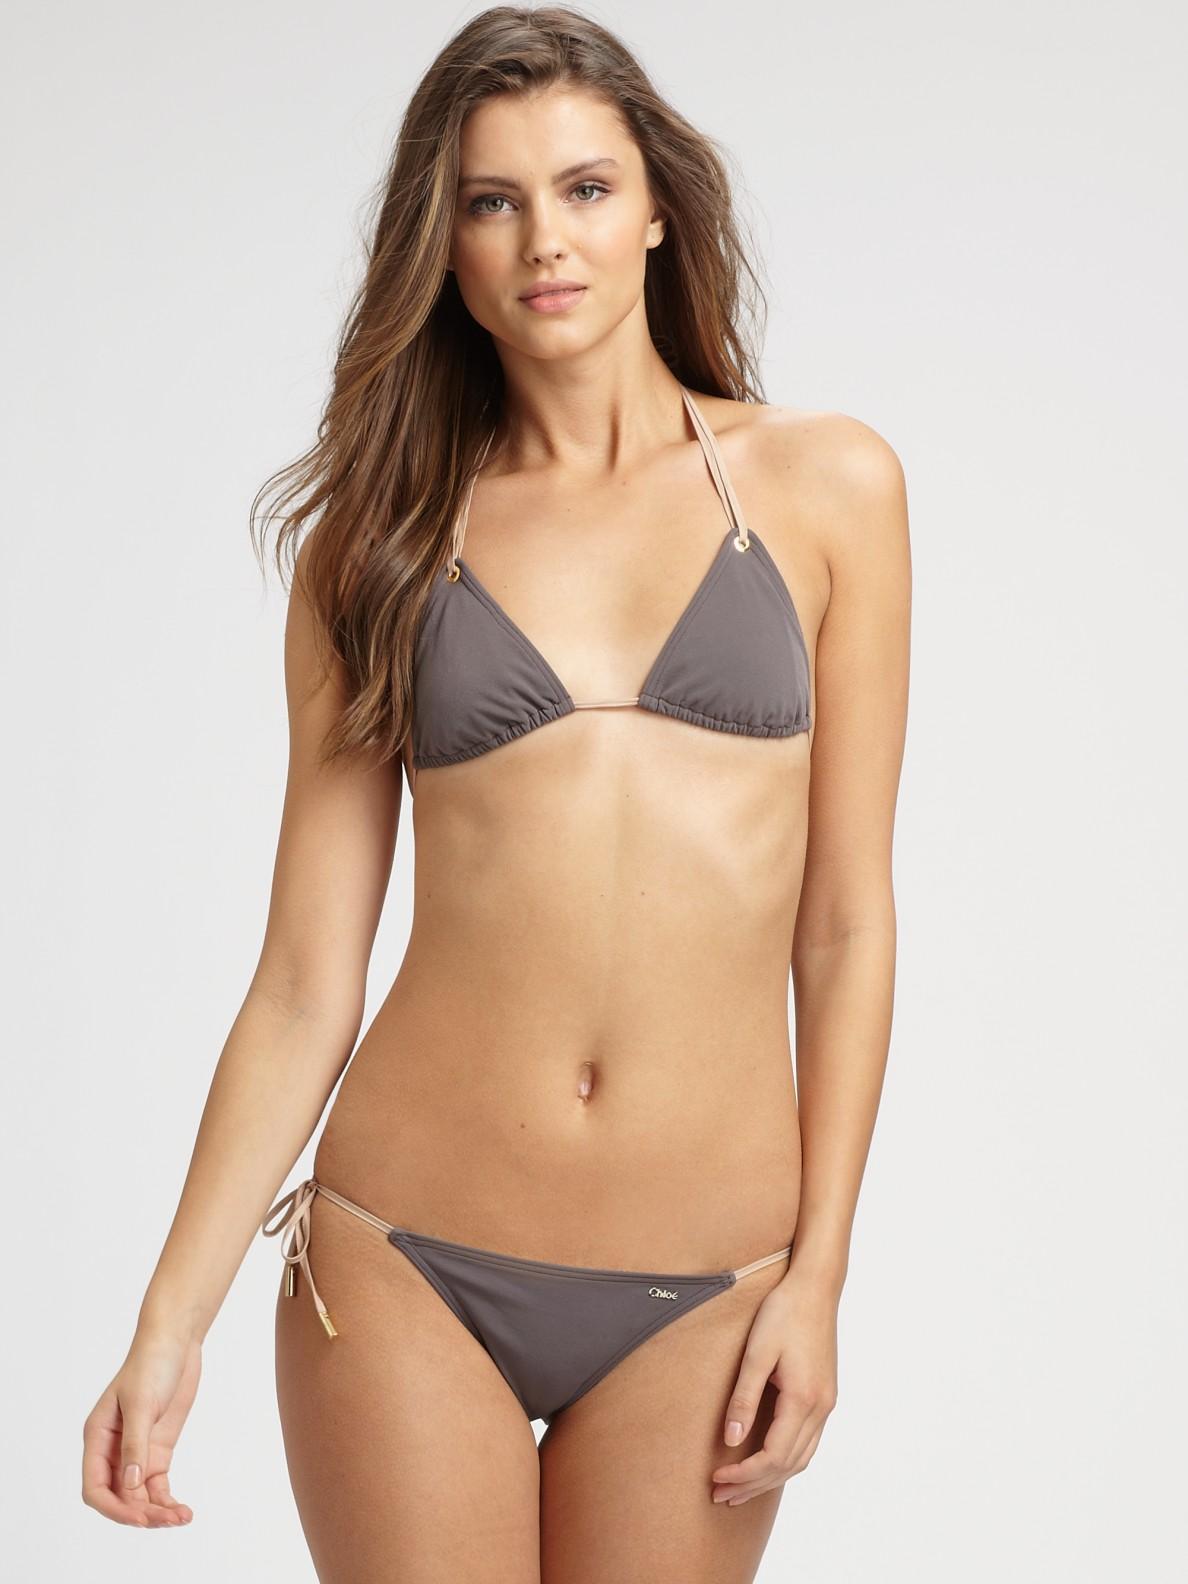 Chlo 233 Double Tie String Bikini Swimsuit In Brown Lyst